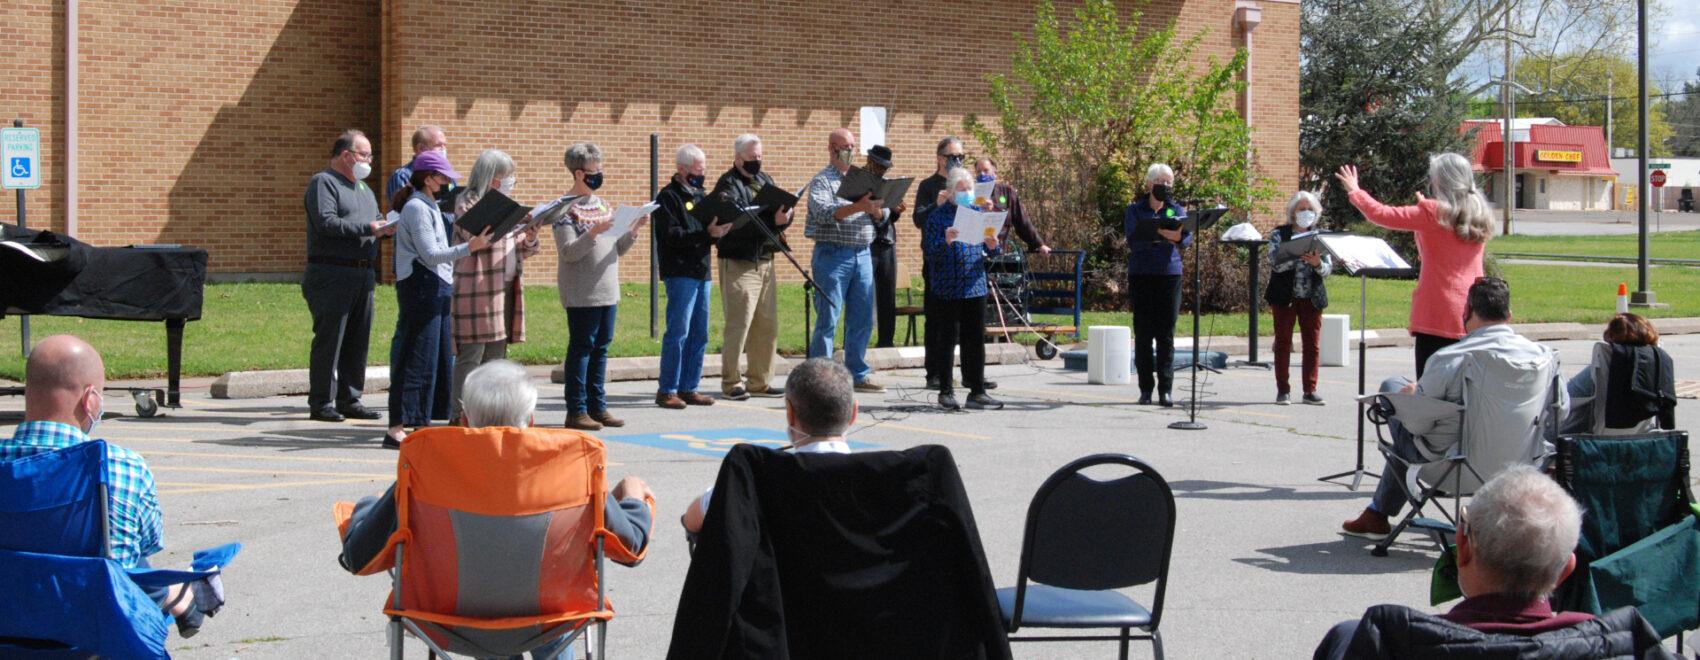 Choir singing outside of United Church of Christ Tulsa OK